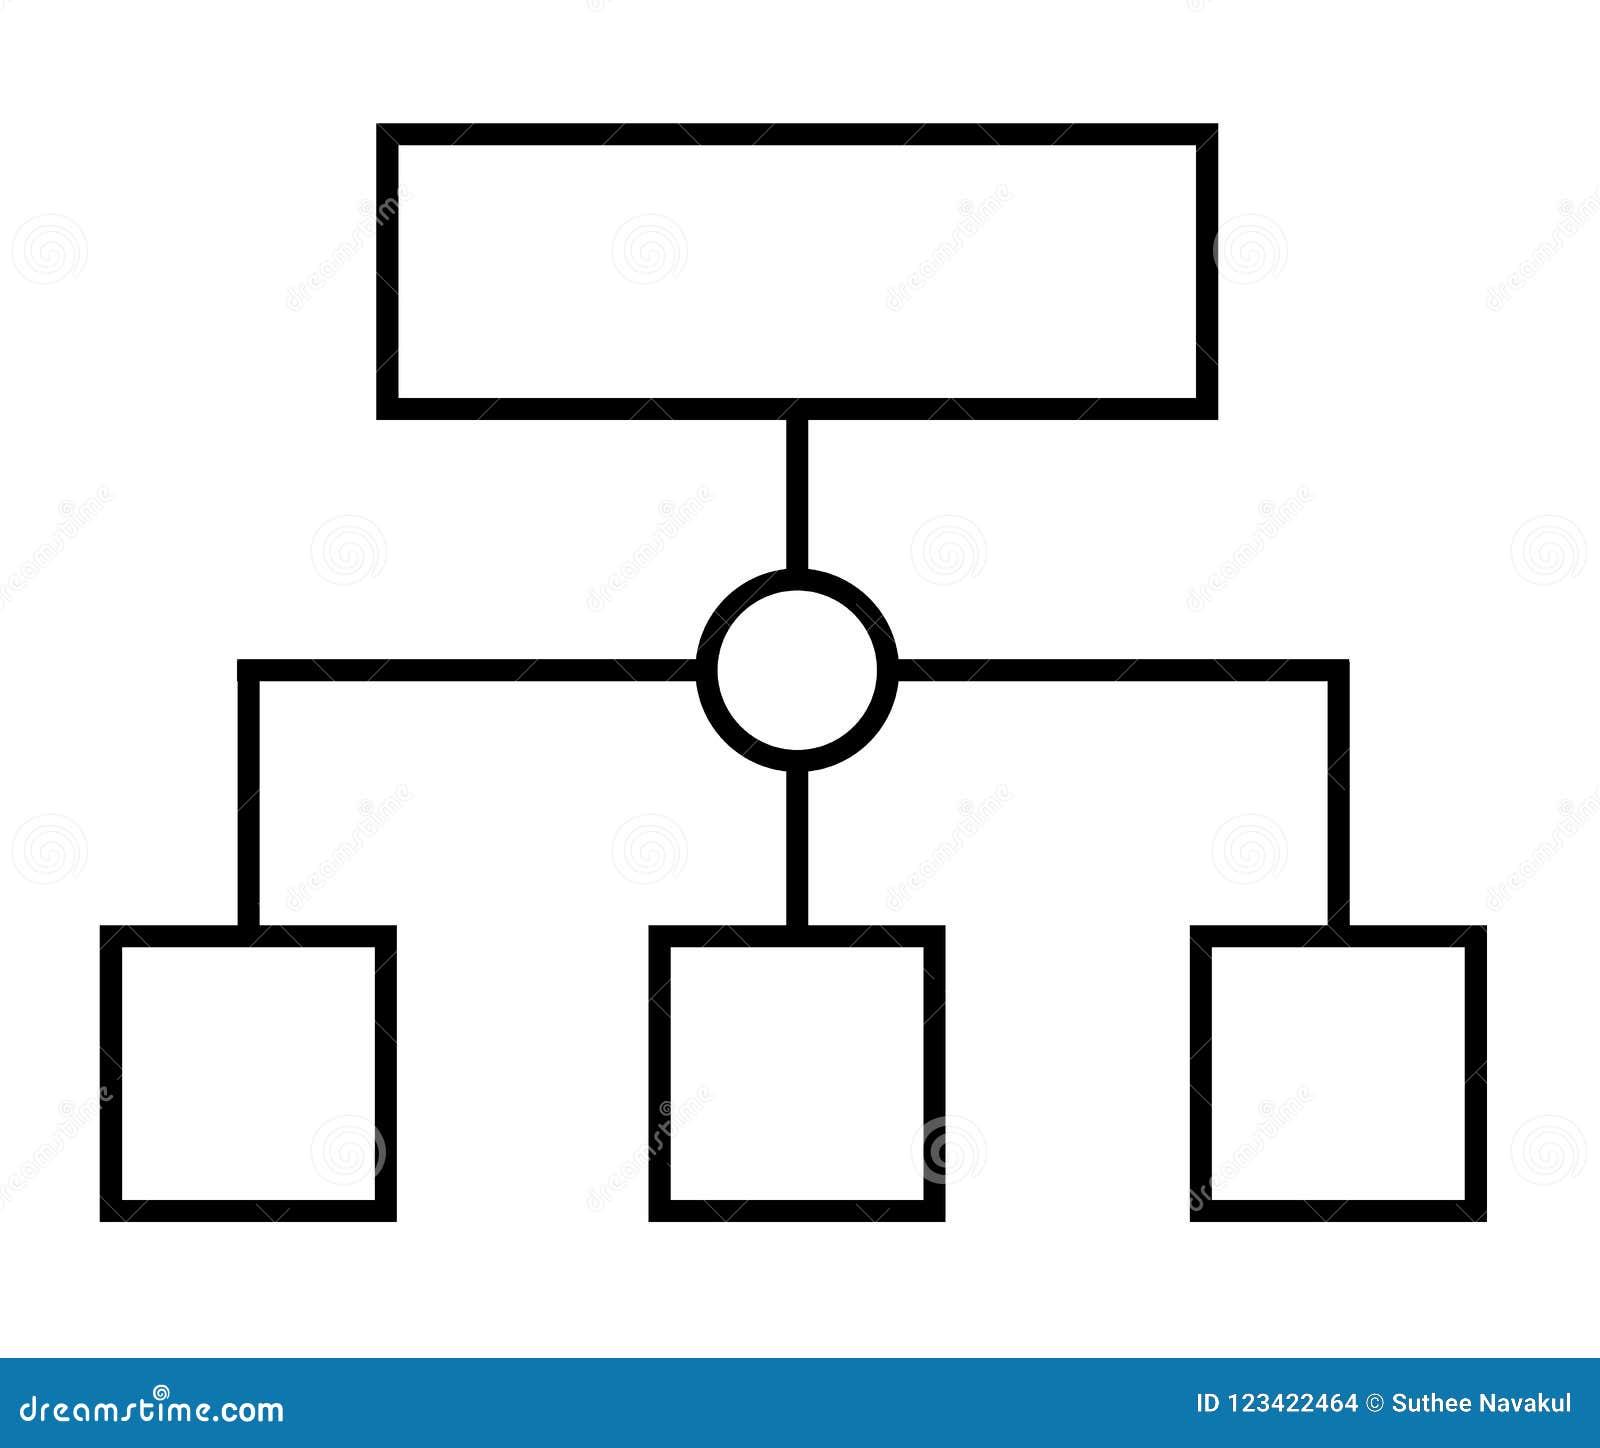 Programmplanung oder dünne Linie Ikone sitemap Arbeitsflusses flaches styt